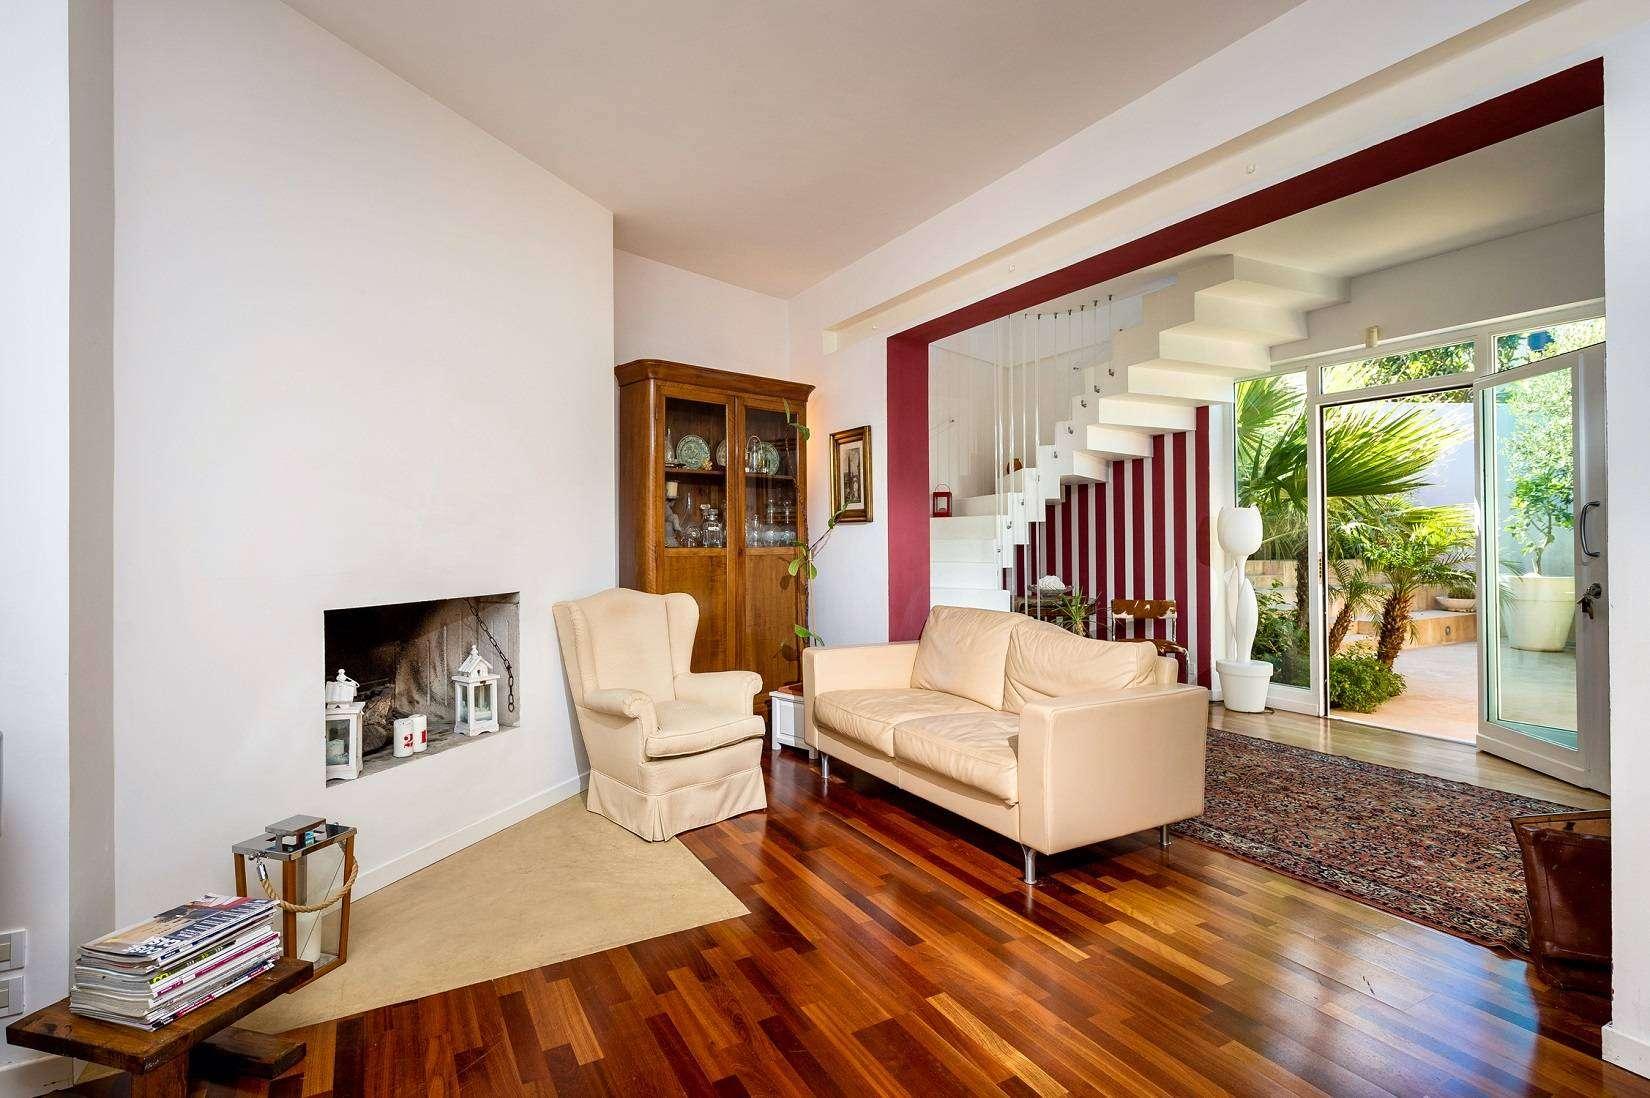 4 Dei Mori living room